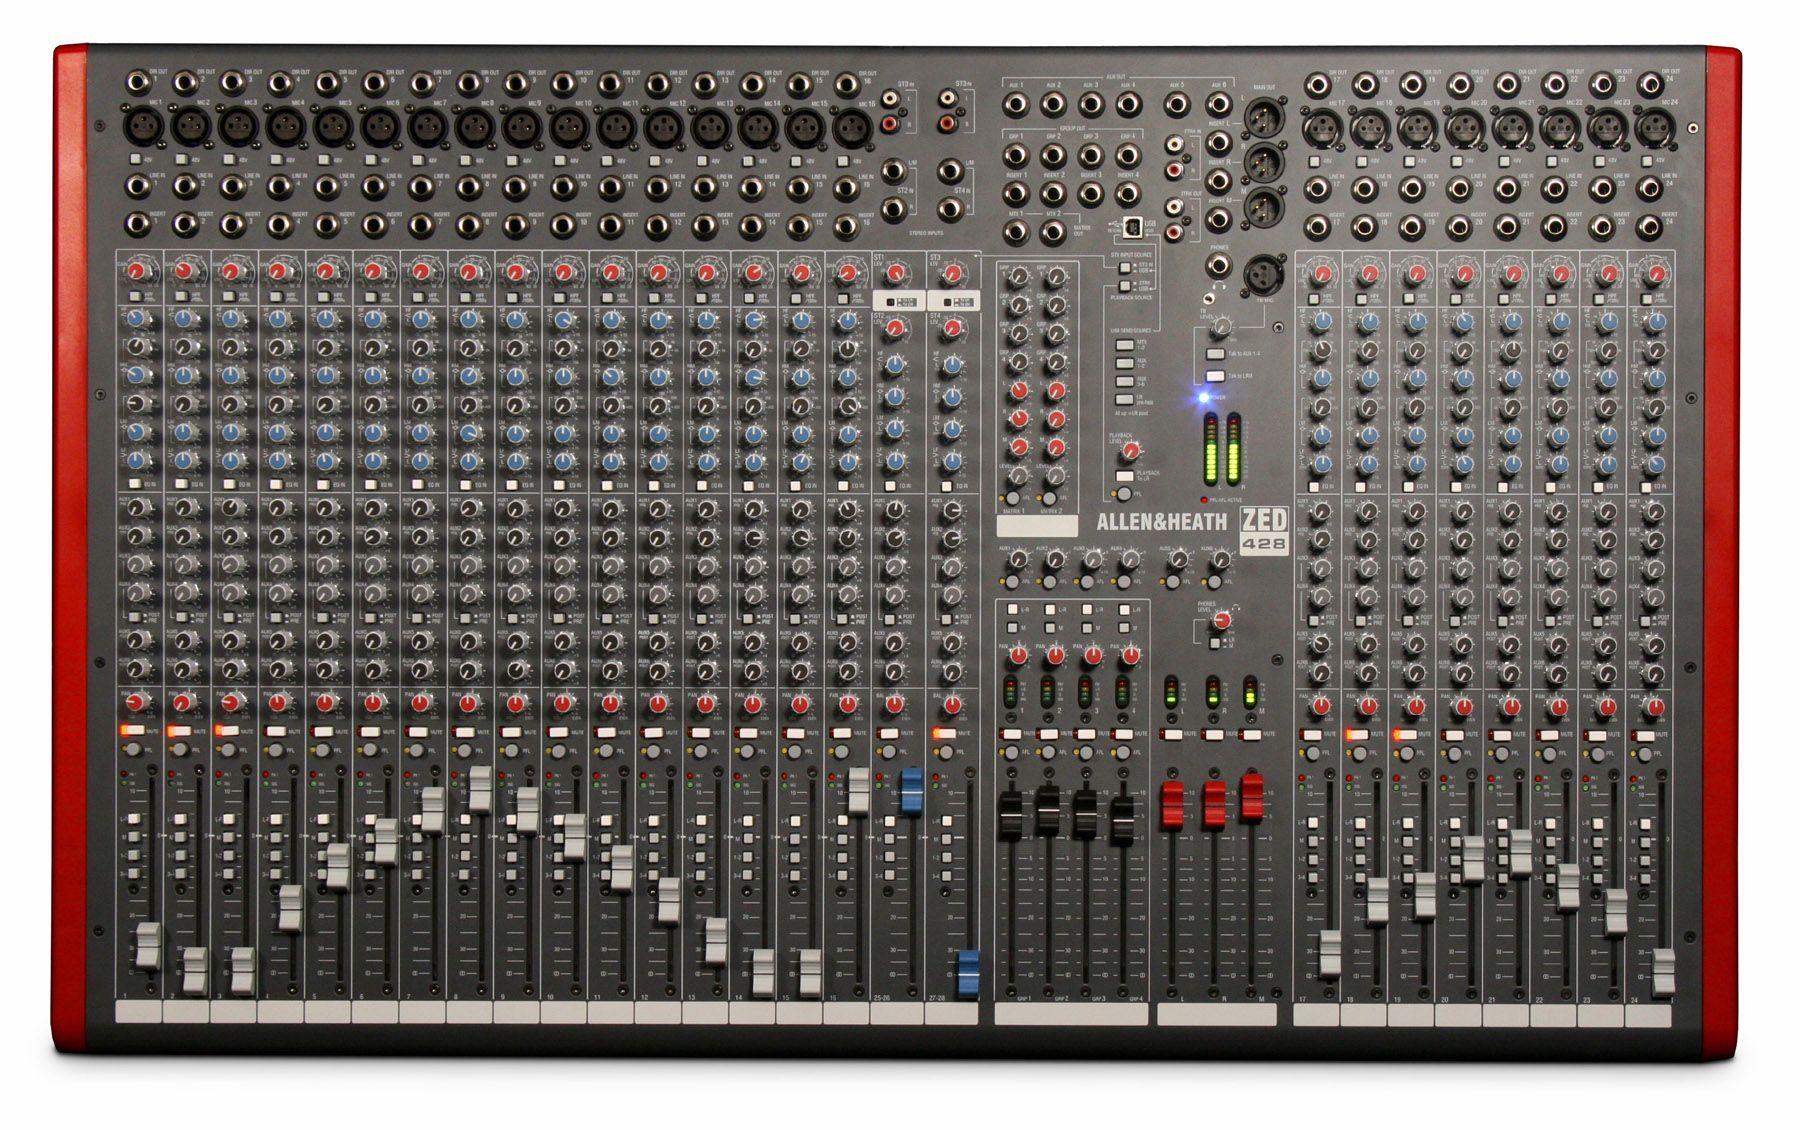 Allen&Heath ZED-428 Mixer, Mischpult, 24 Mikrofonkanäle+4 StereoInputs, Software